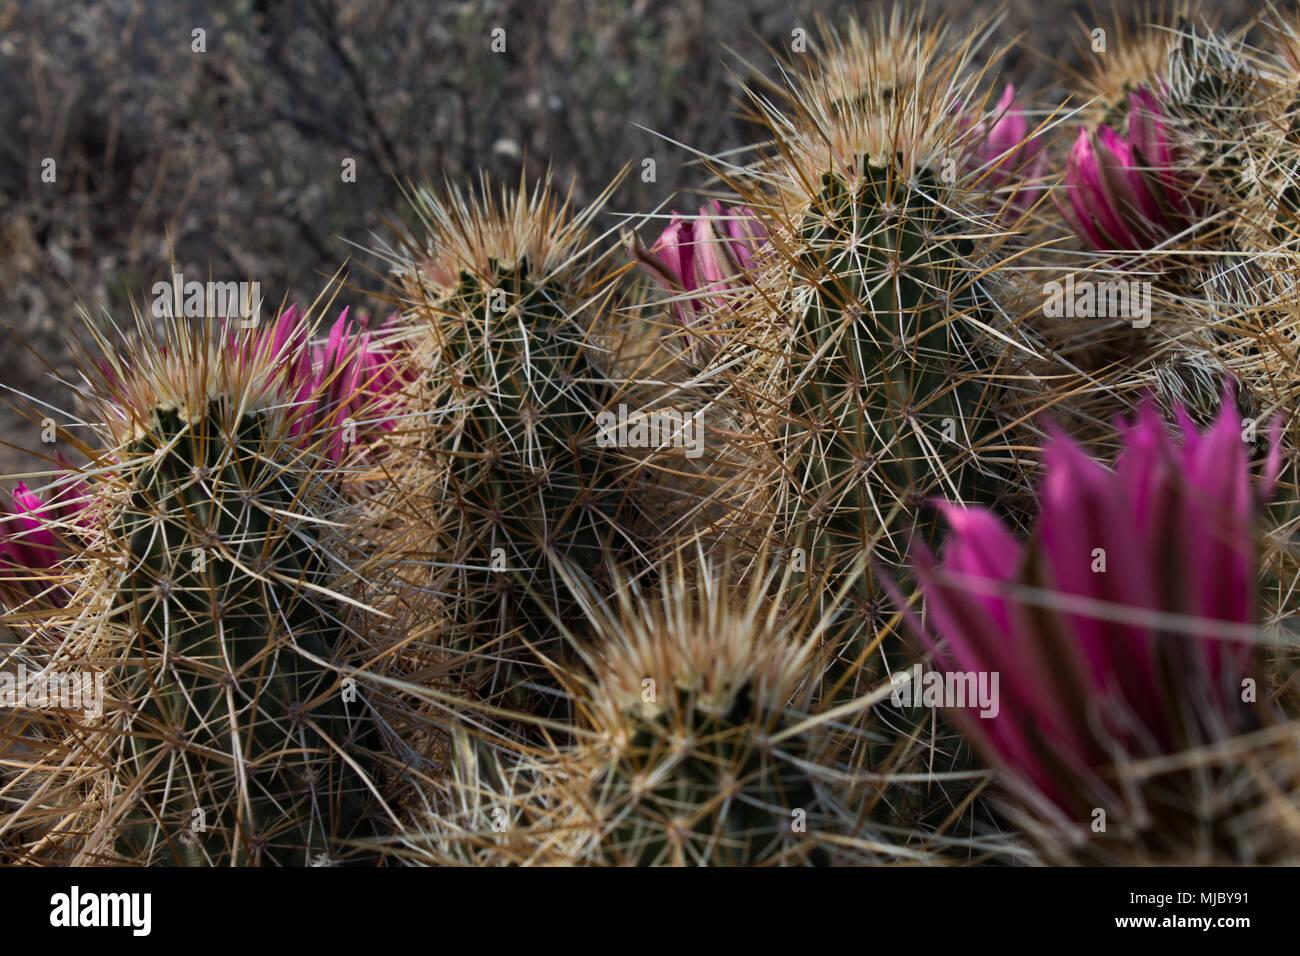 Arizona Cactus With Pink Flowers Stock Photo 183430381 Alamy